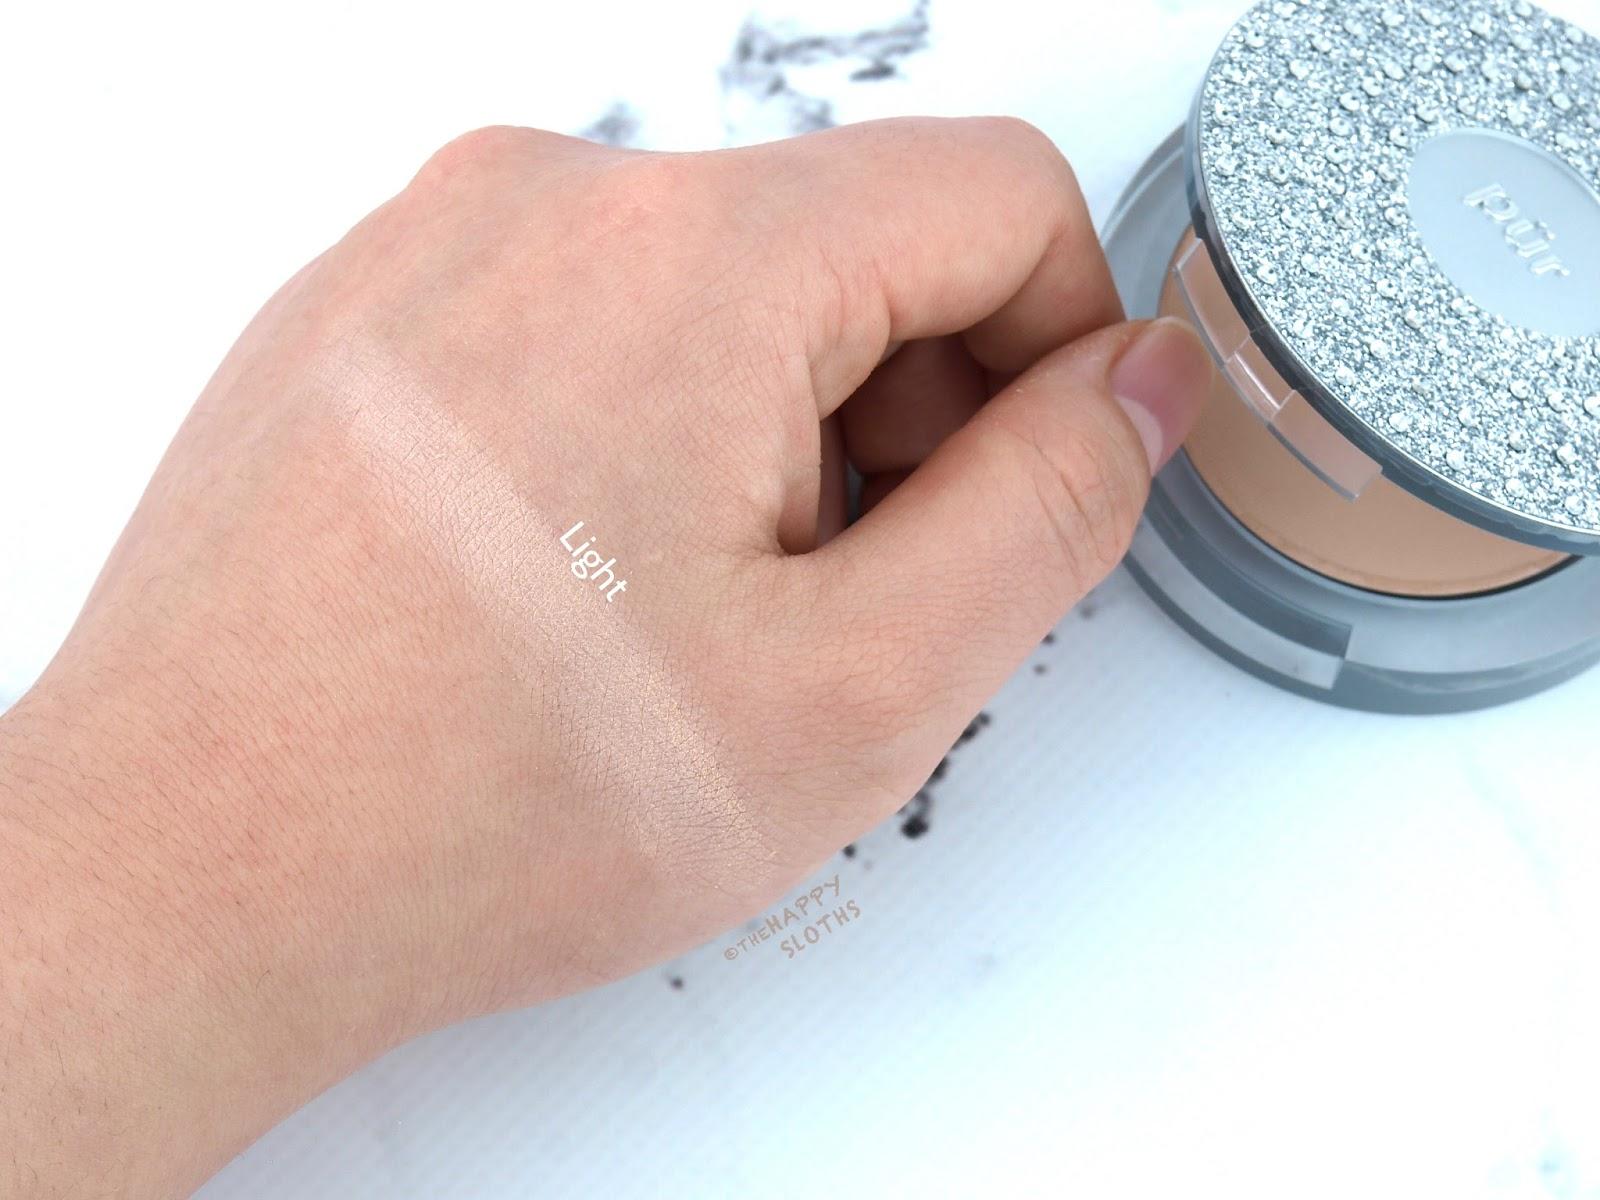 4-in-1 Pressed Mineral Powder Foundation SPF 15 by pür #14